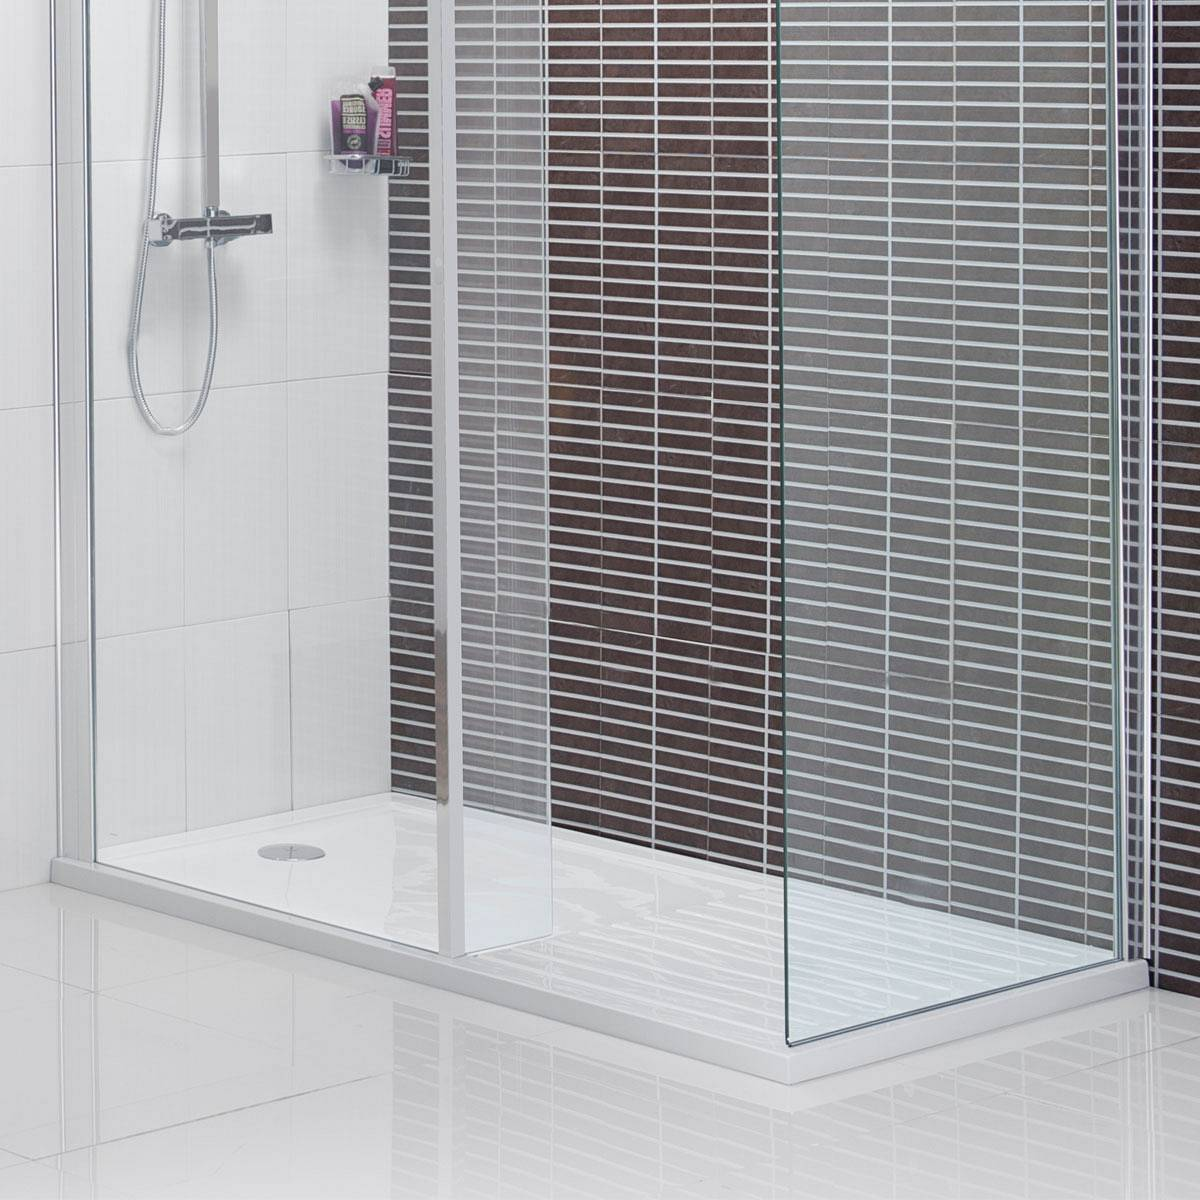 rectangular walk in shower tray 1600 x 800. Black Bedroom Furniture Sets. Home Design Ideas